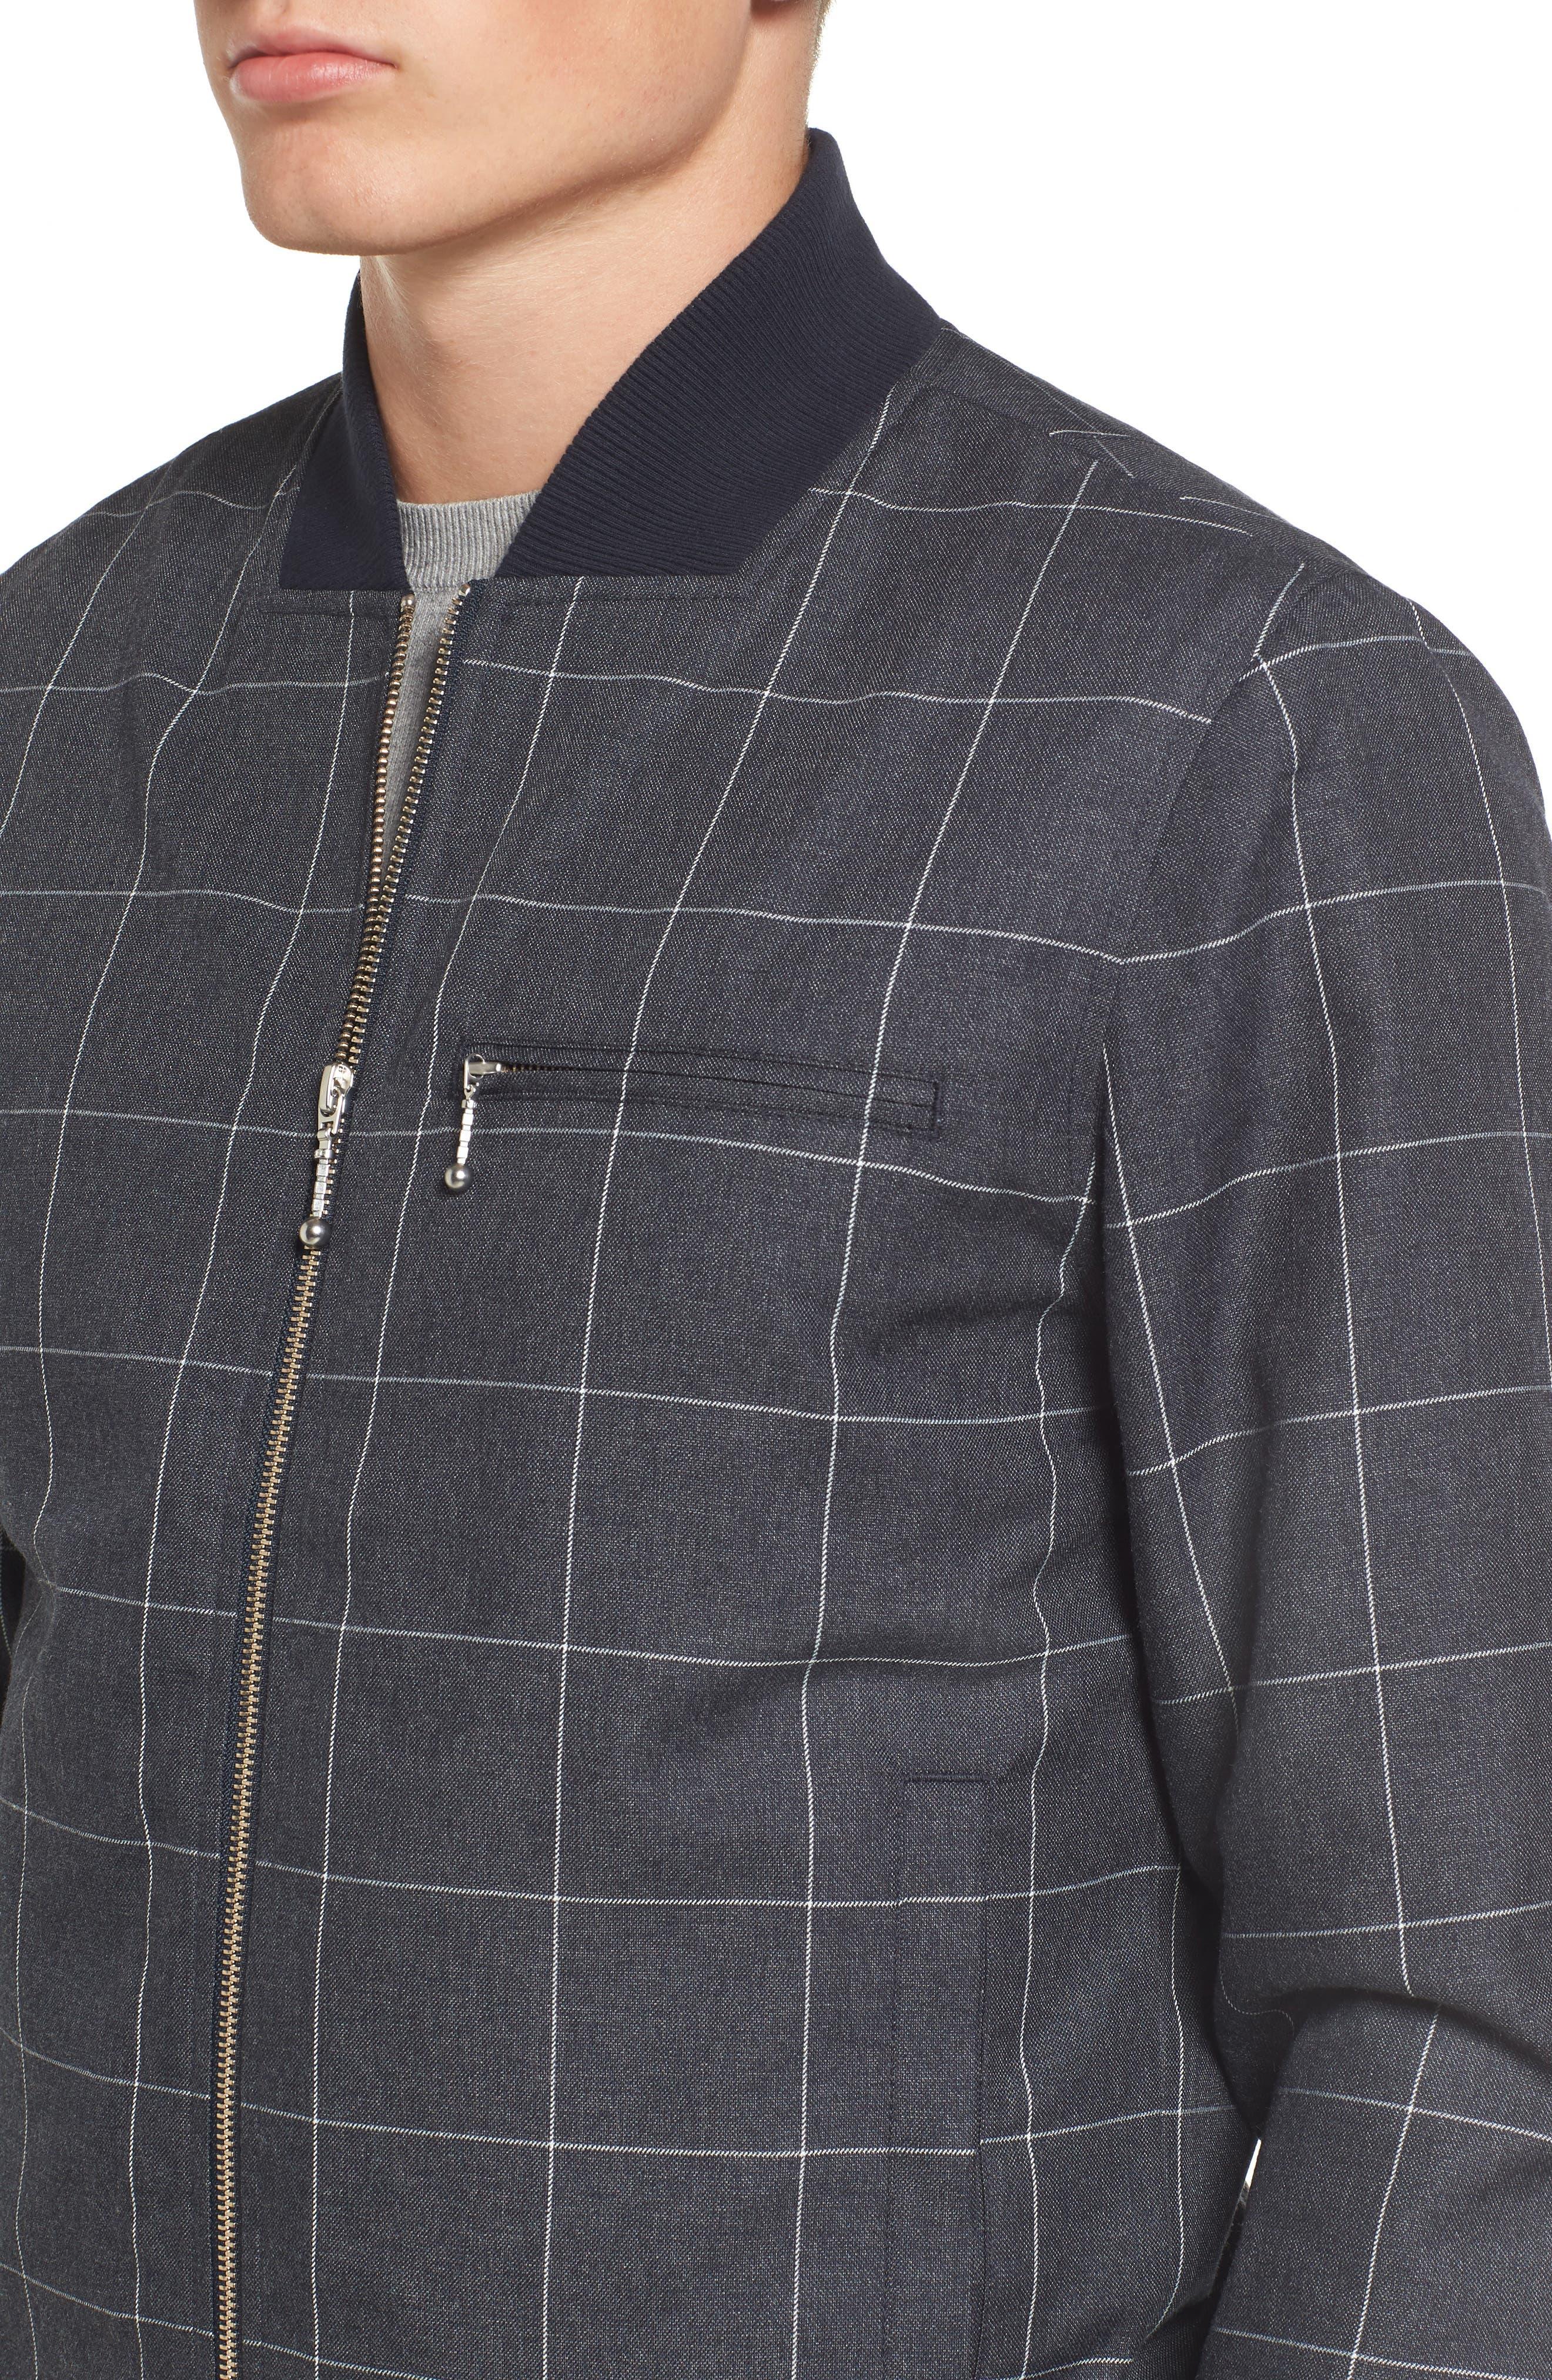 Check Flannel Bomber Jacket,                             Alternate thumbnail 4, color,                             419